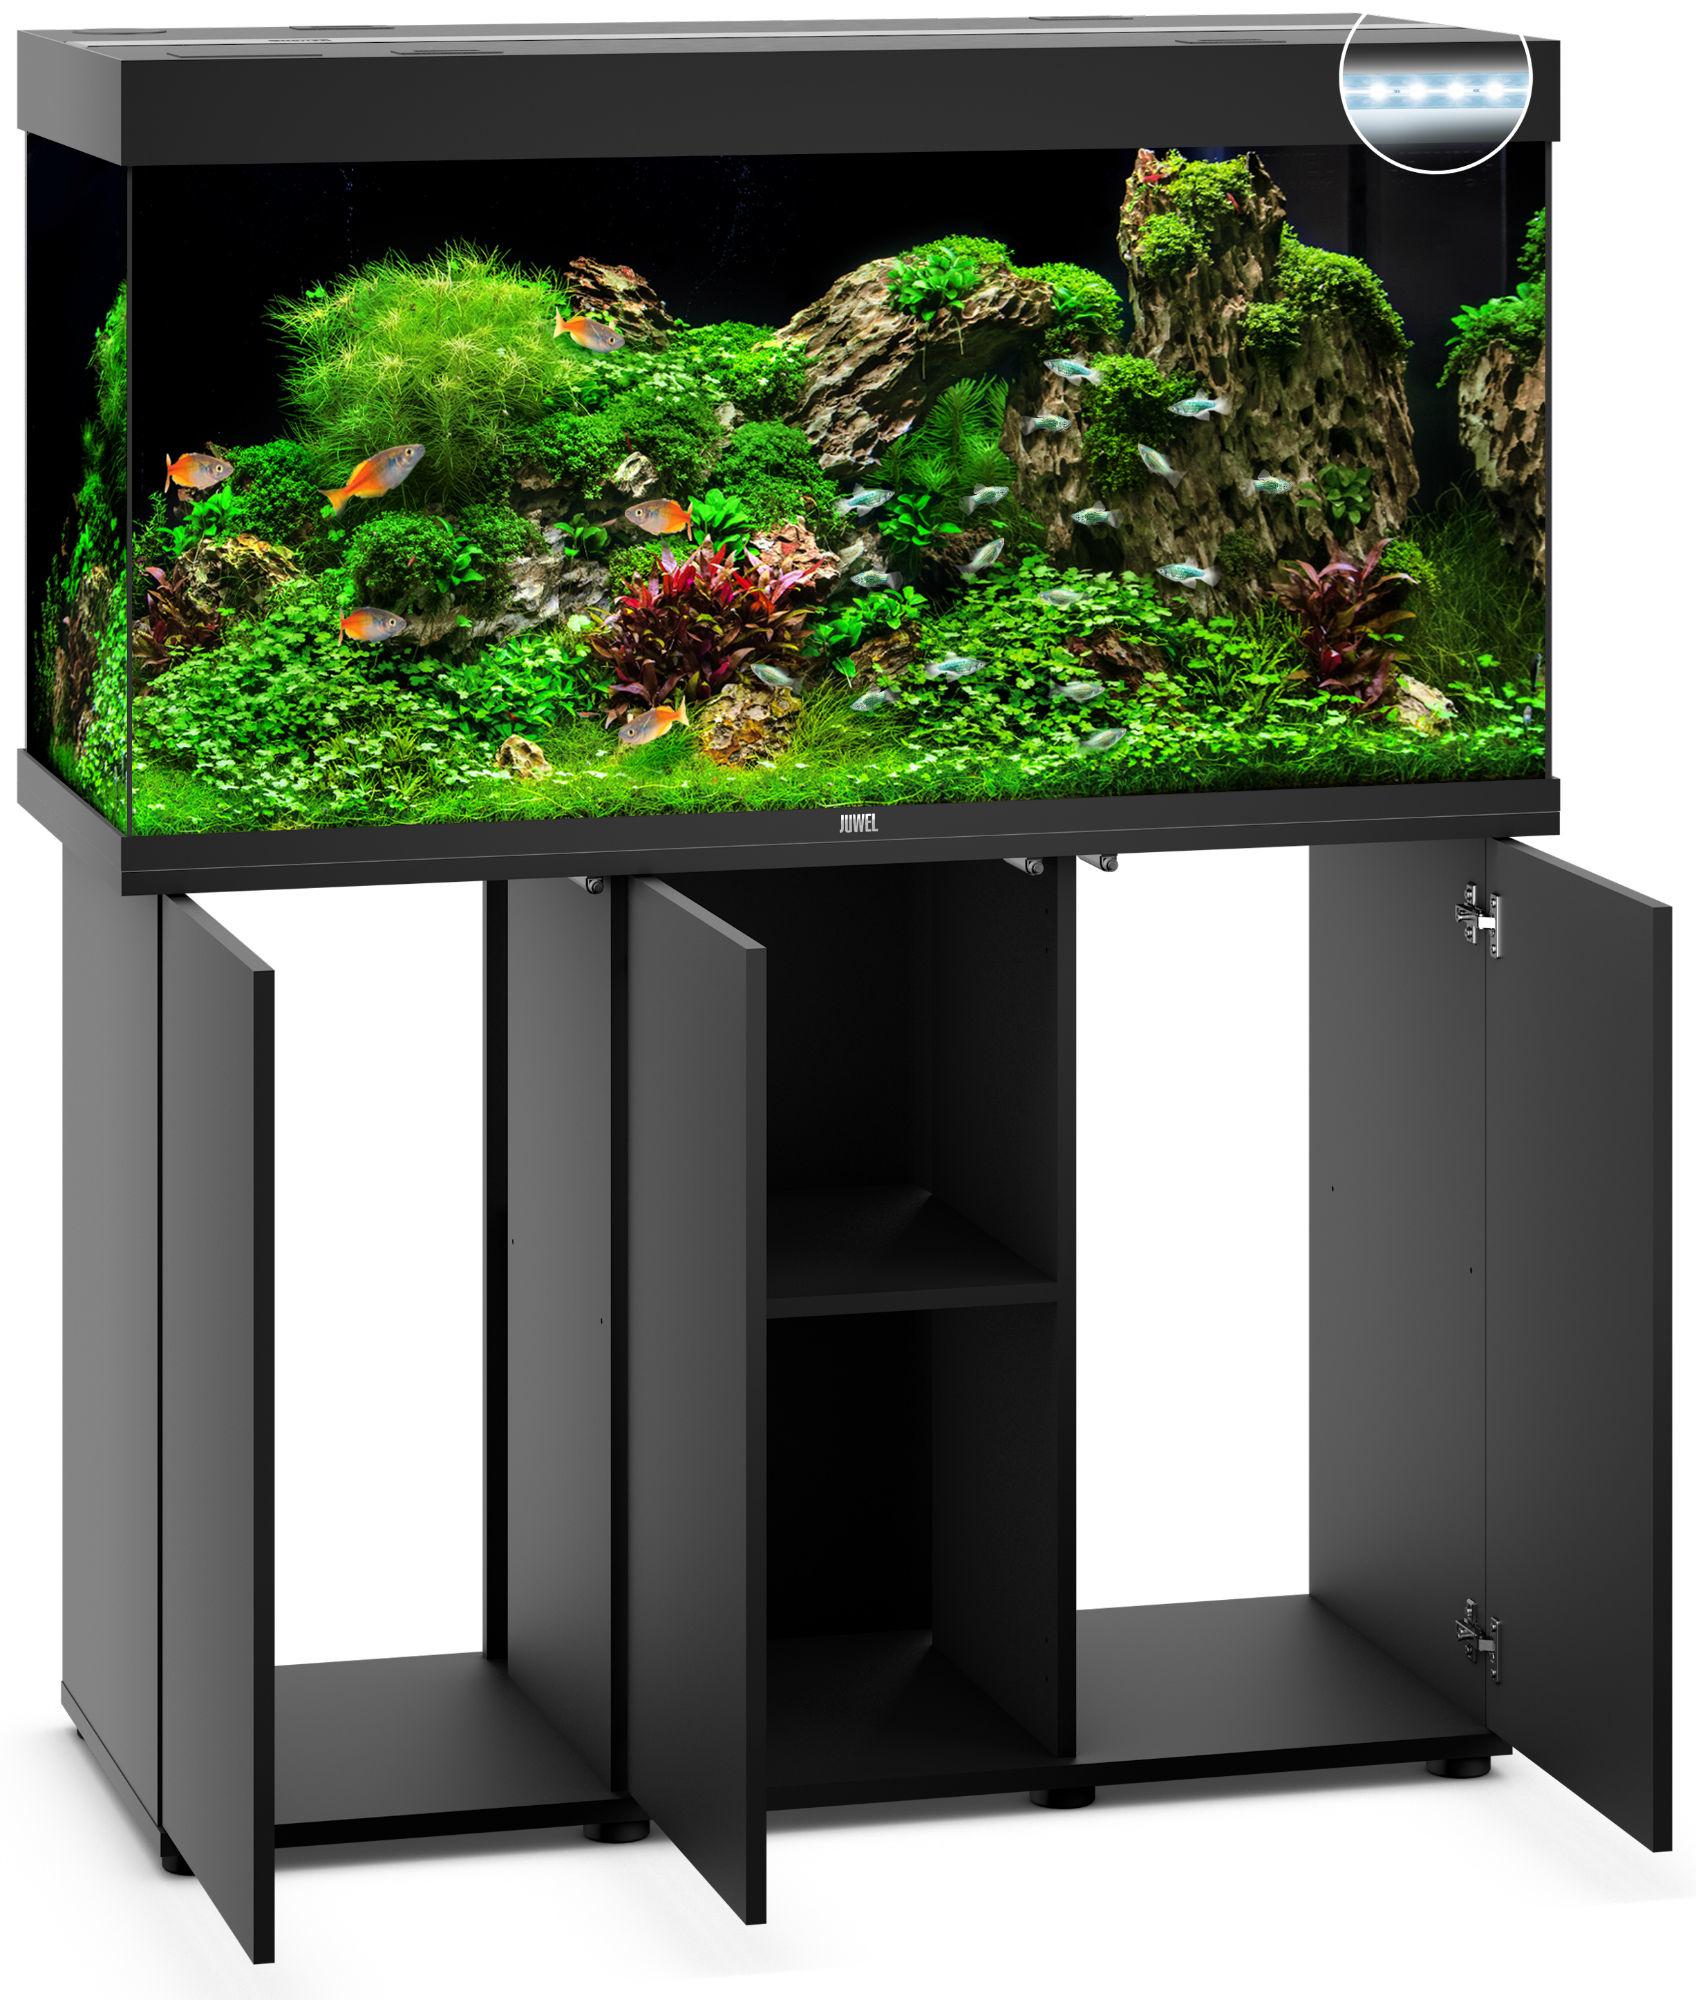 Juwel rio 350 led aquarium mit unterschrank ebay for Aquarium mit unterschrank